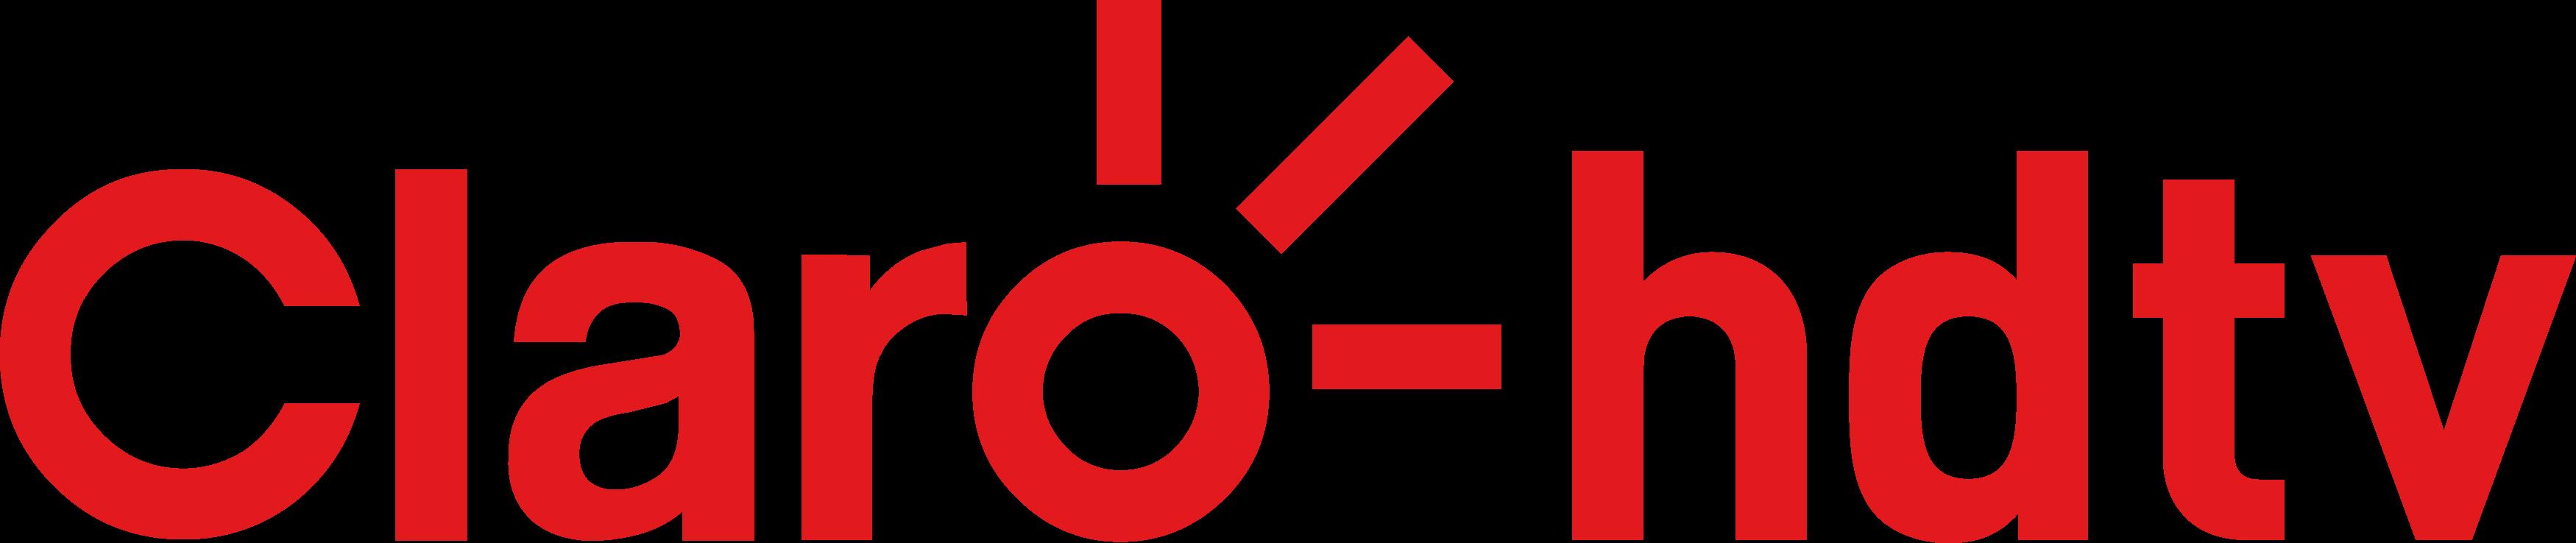 claro-hdtv-logo